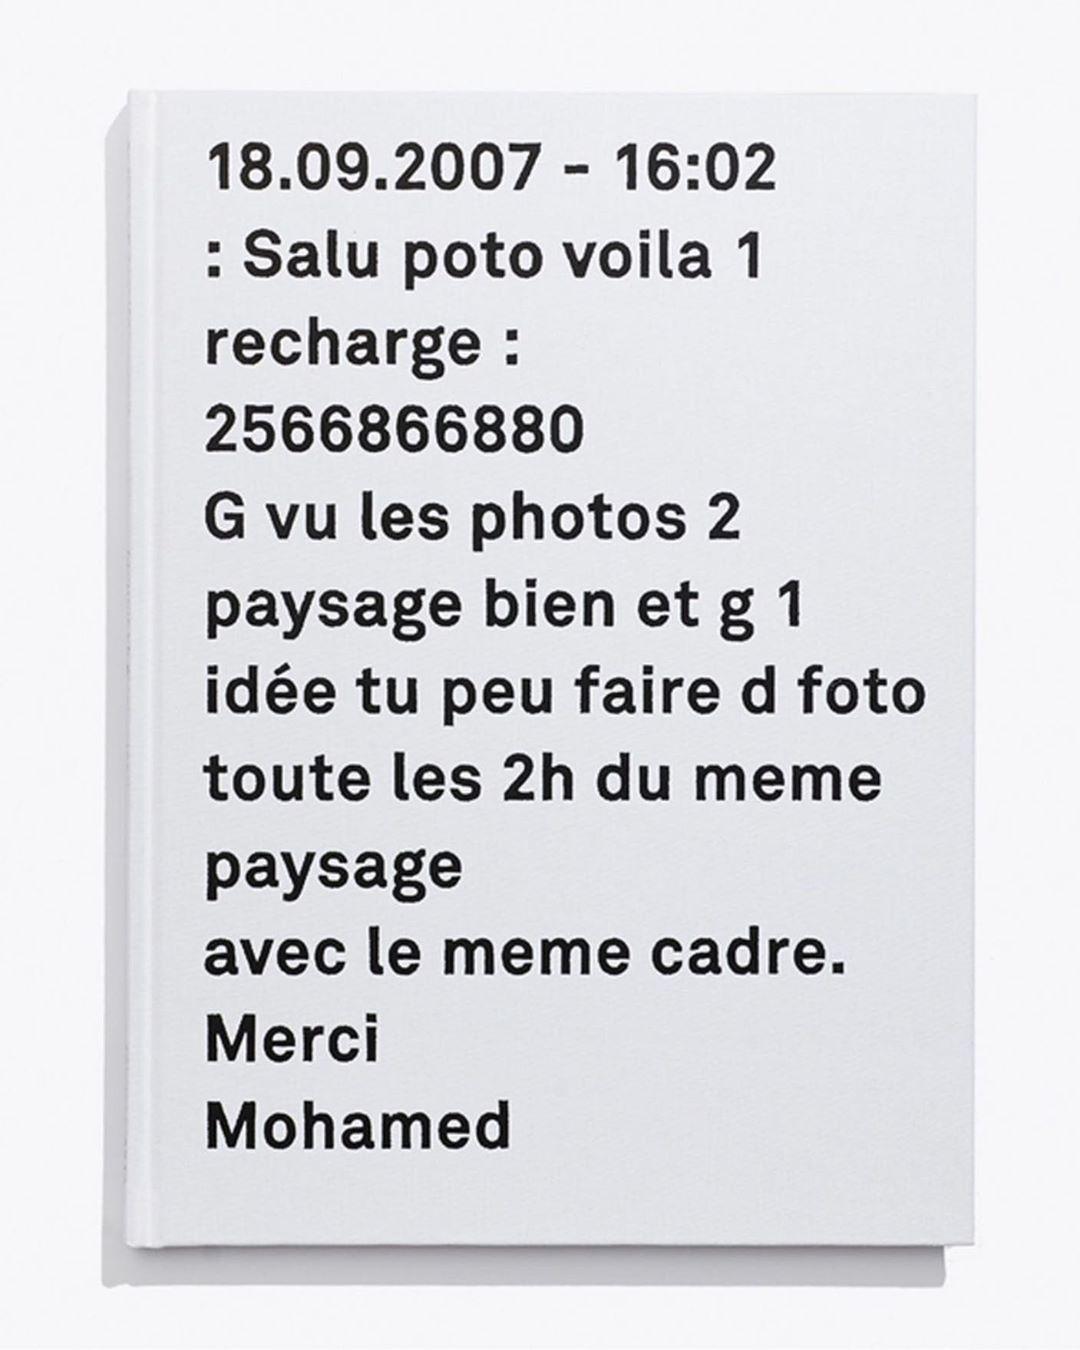 Temps Mort by Mohamed Bourouissa w/ @mohamedbourouissa @etudesbooks @kamelmennour #2014